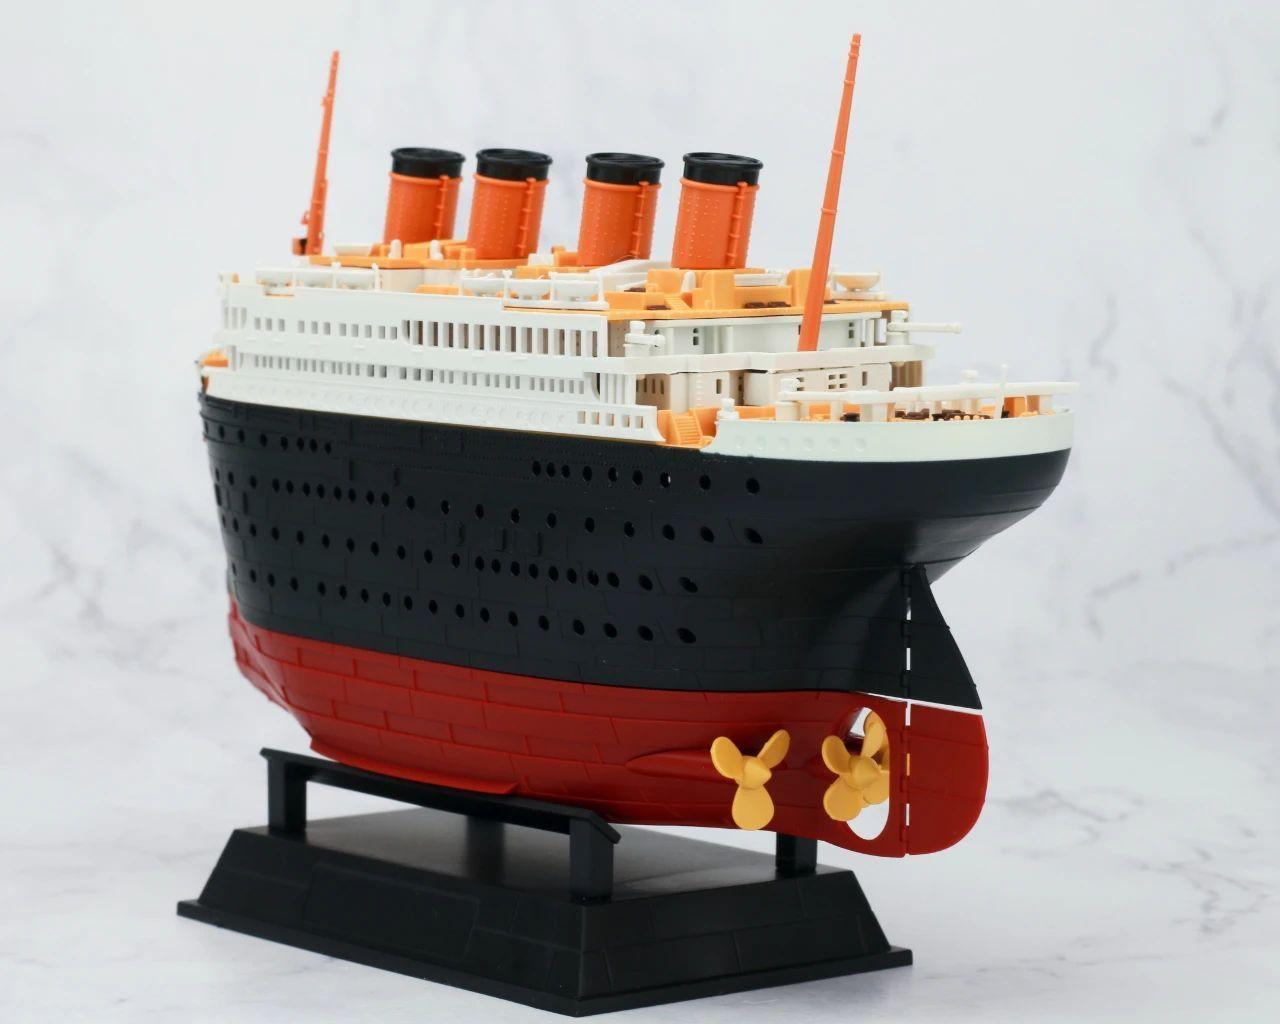 S484_1_2_RMS_Titanic_ice_SOUTHAMPTON_017.jpg